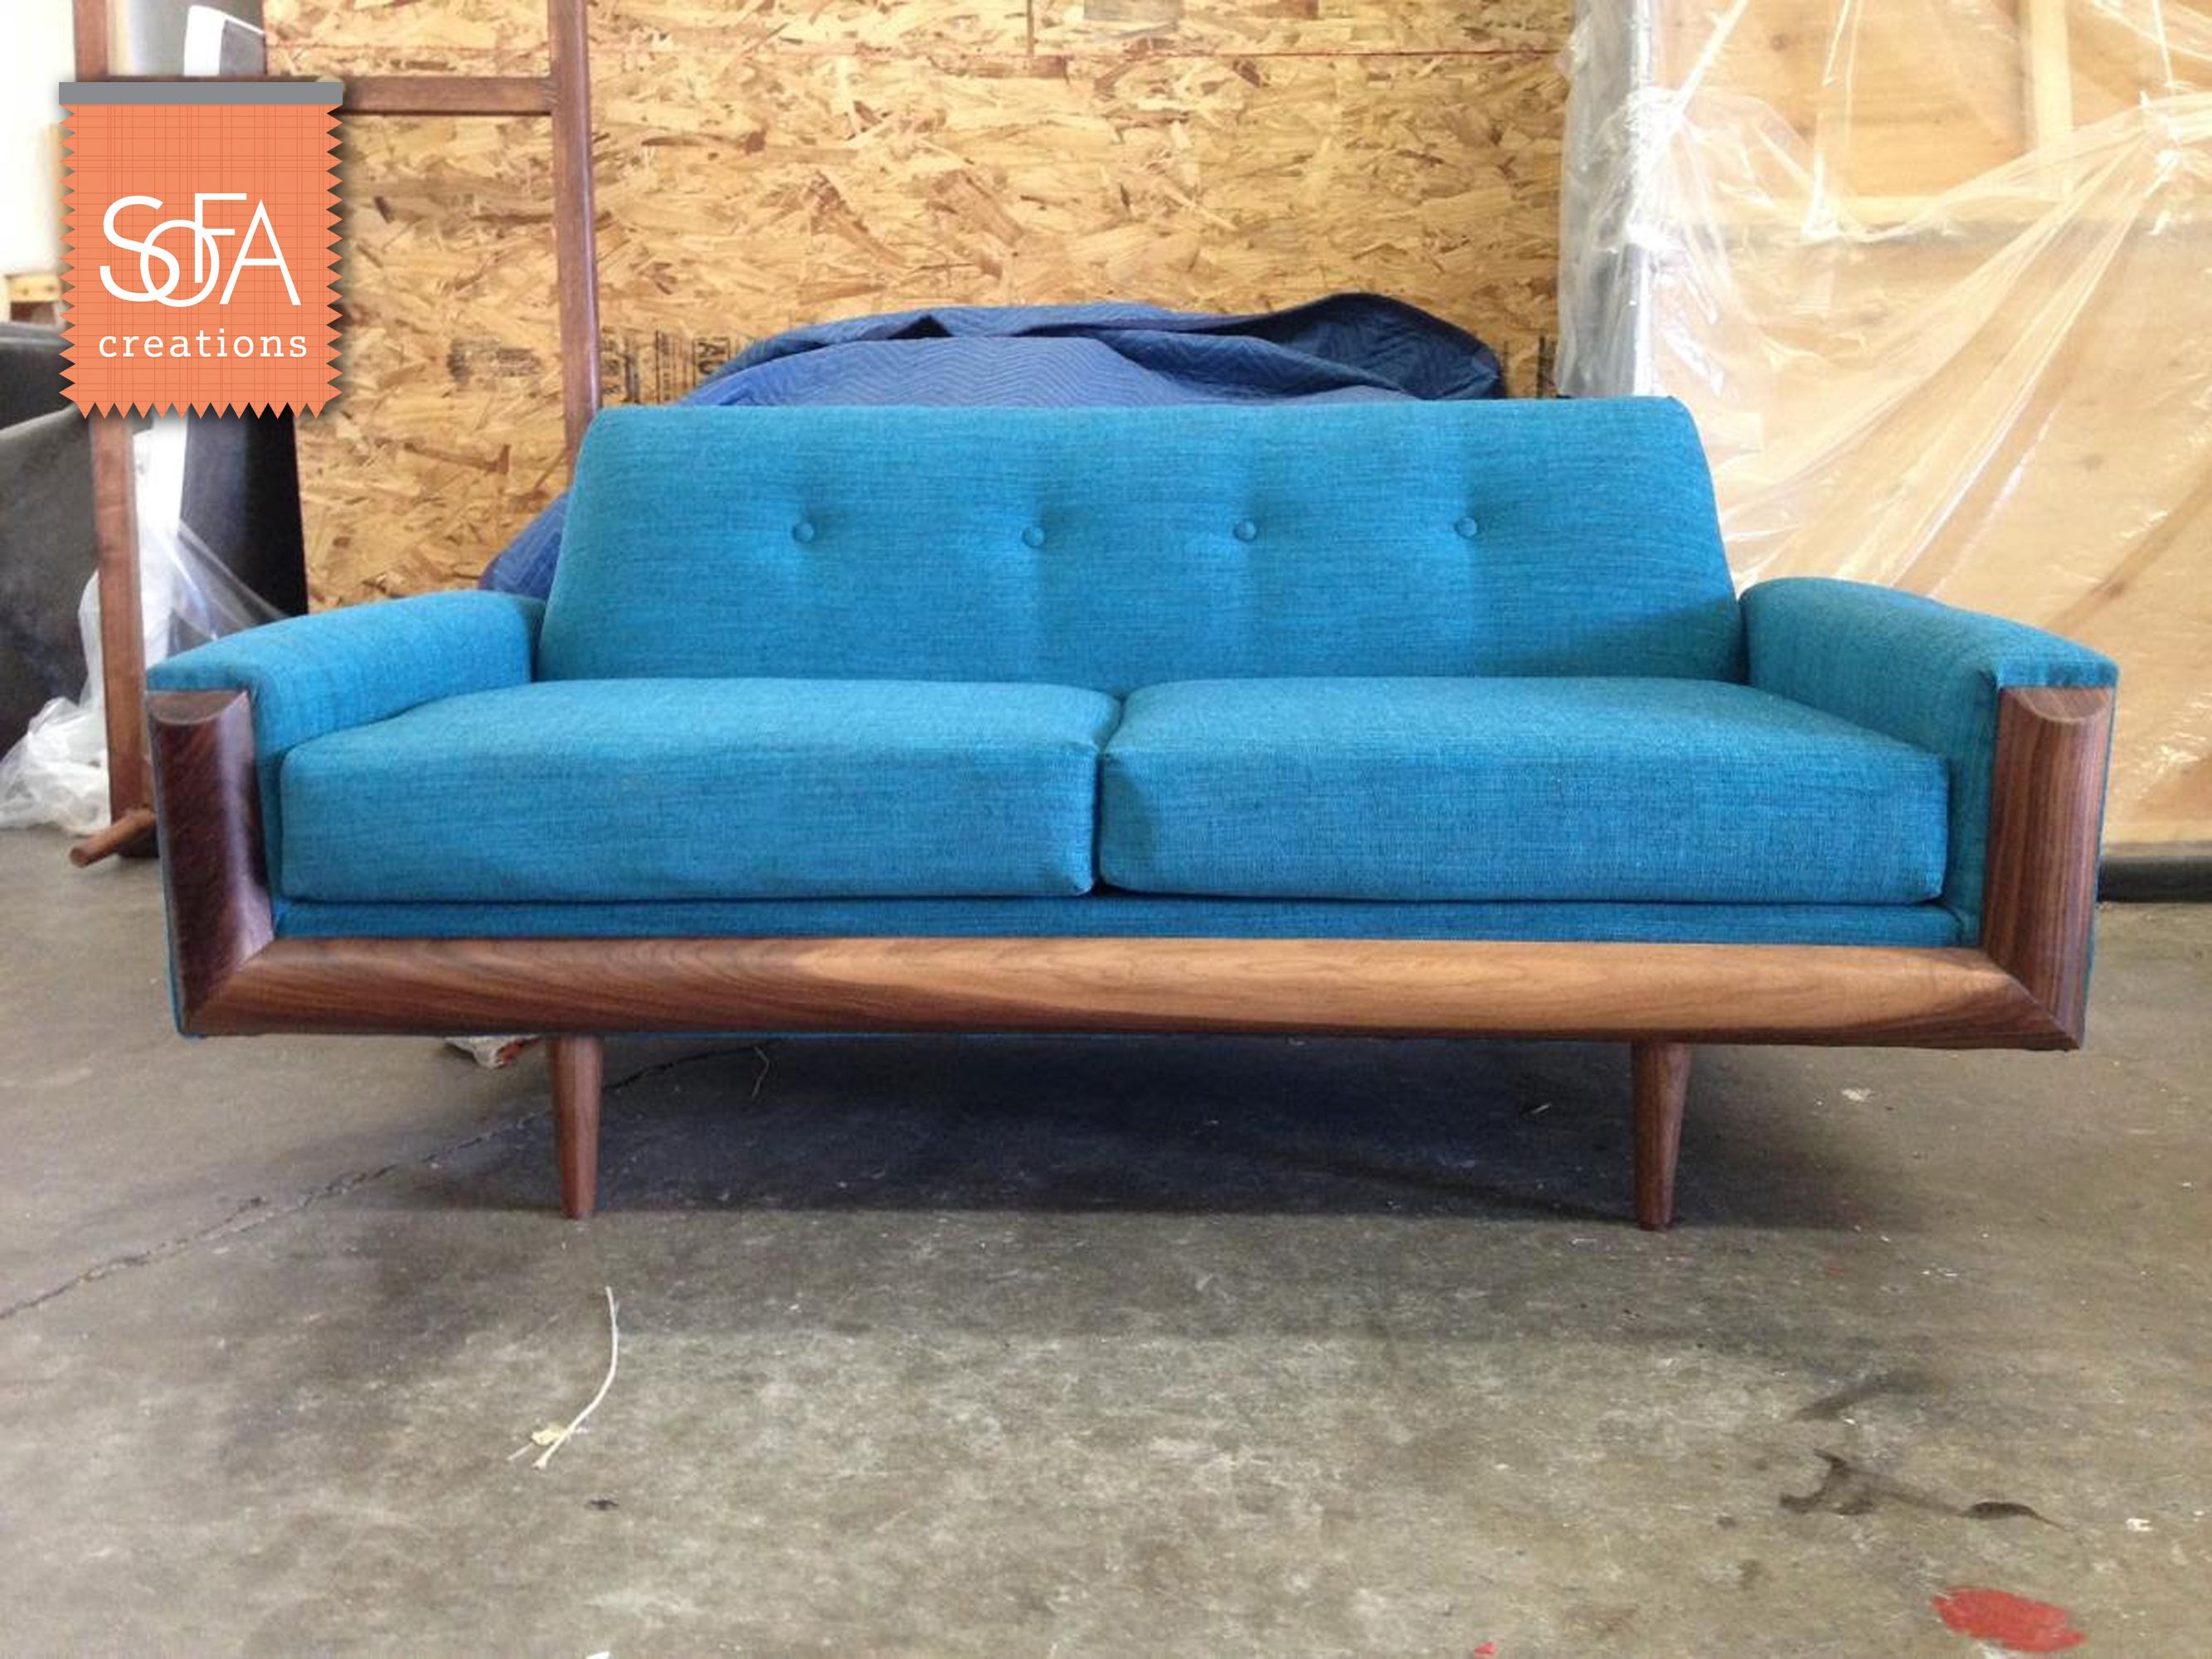 Woodside Sofa with Custom Wood Base - The Woodside sofa is ...